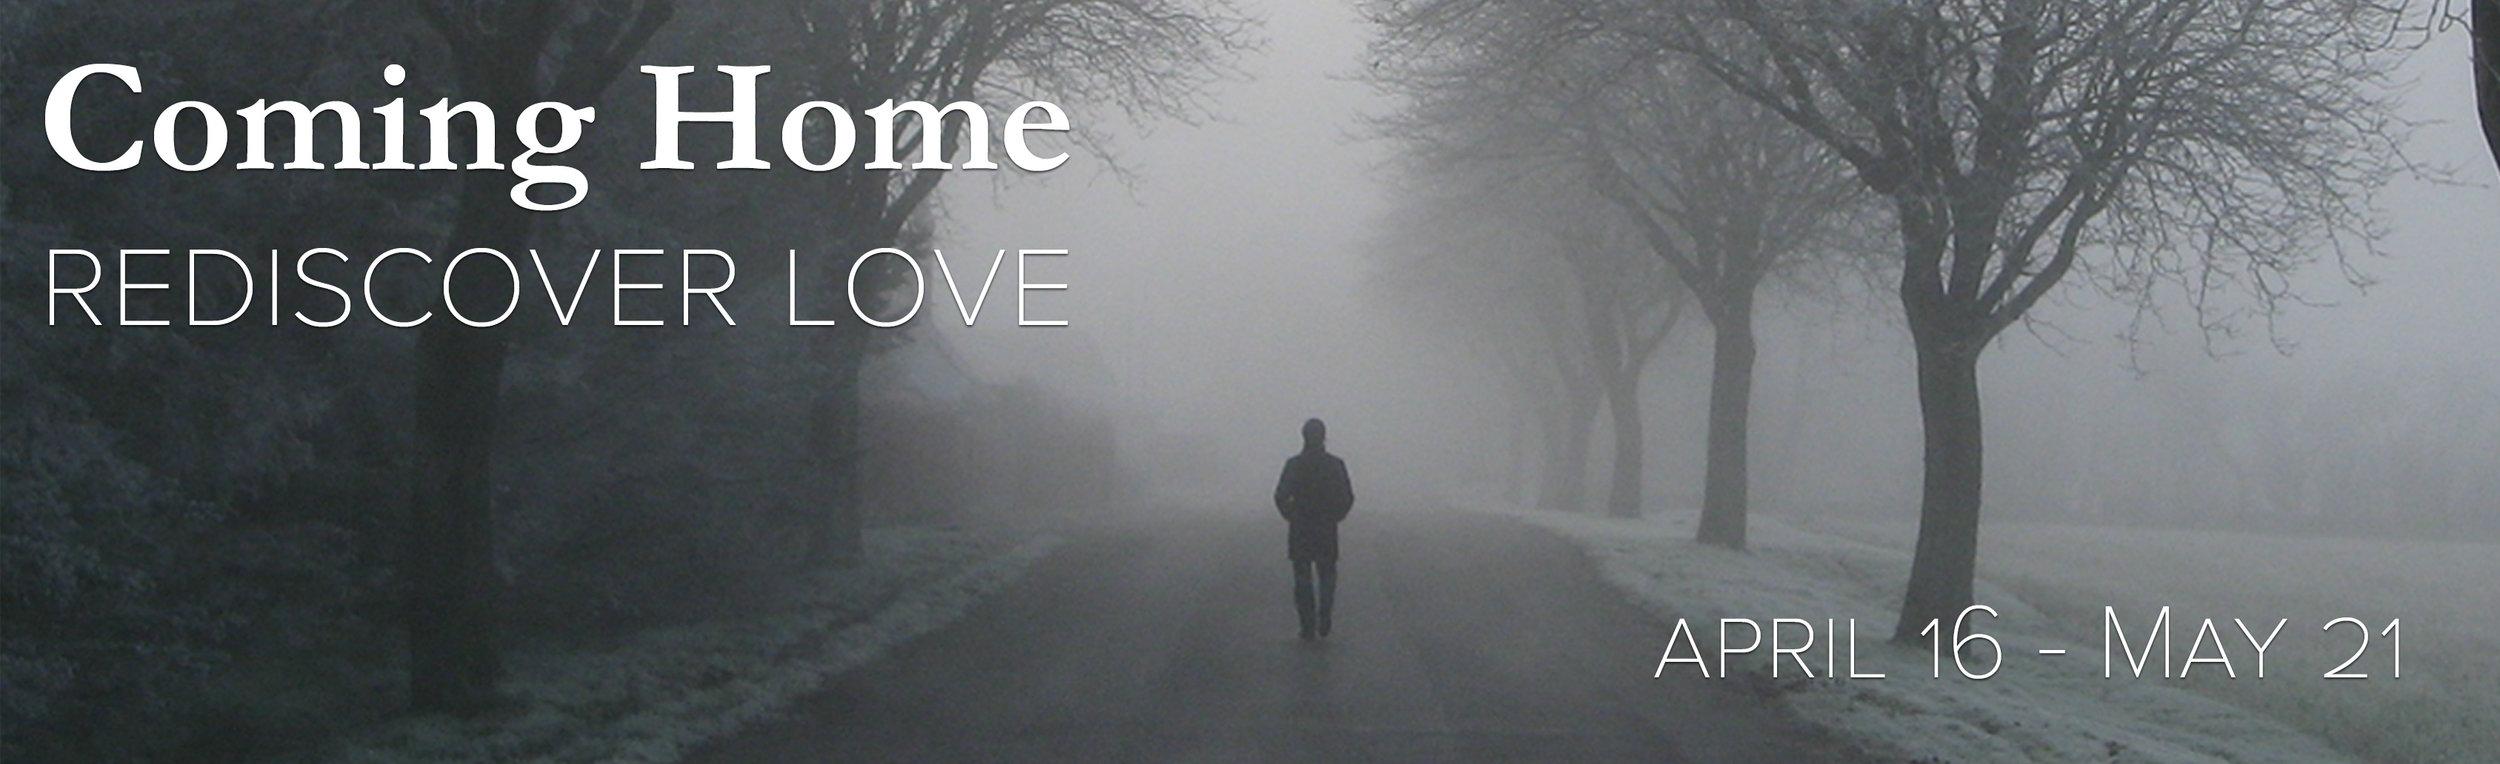 coming-home_web-banner.jpg